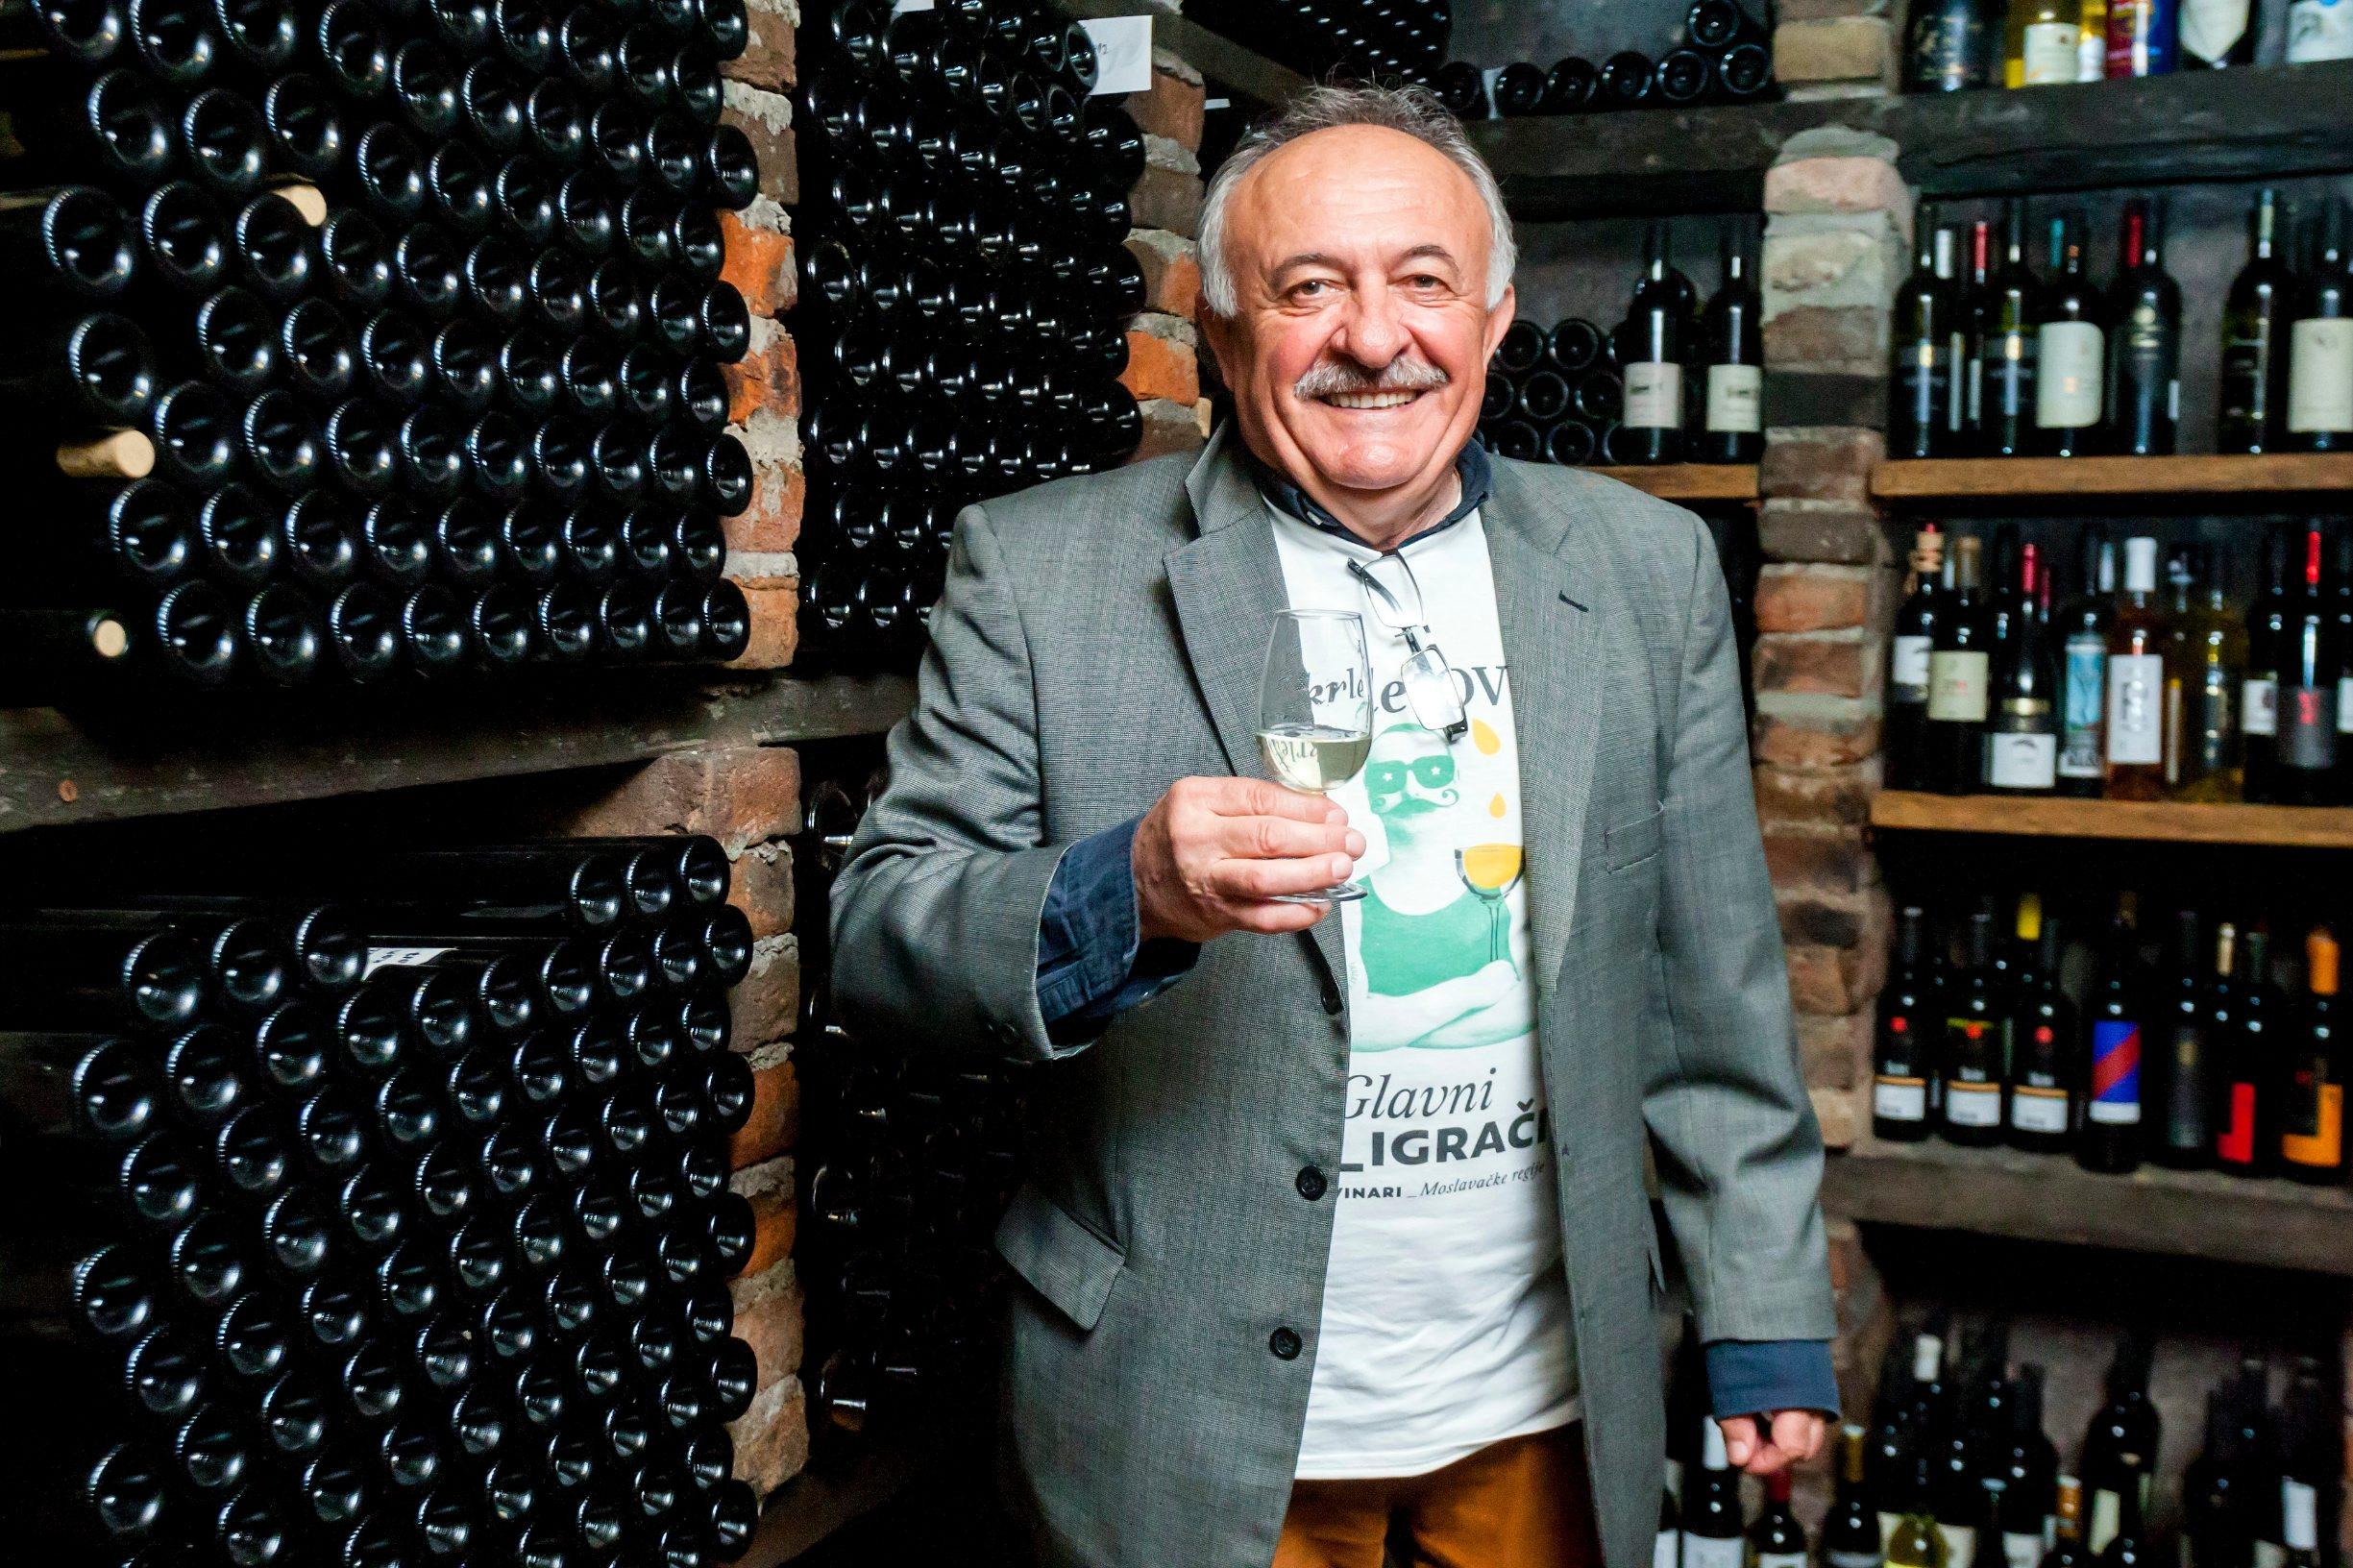 Graberje Ivanicko, 040419. Seosko imanje Kezele. Izbor najboljeg proizvodjaca vina sorte skrlet medju osam moslavackih vinara.  Na fotografiji: Drago Kezele. Foto: Tomislav Kristo / CROPIX